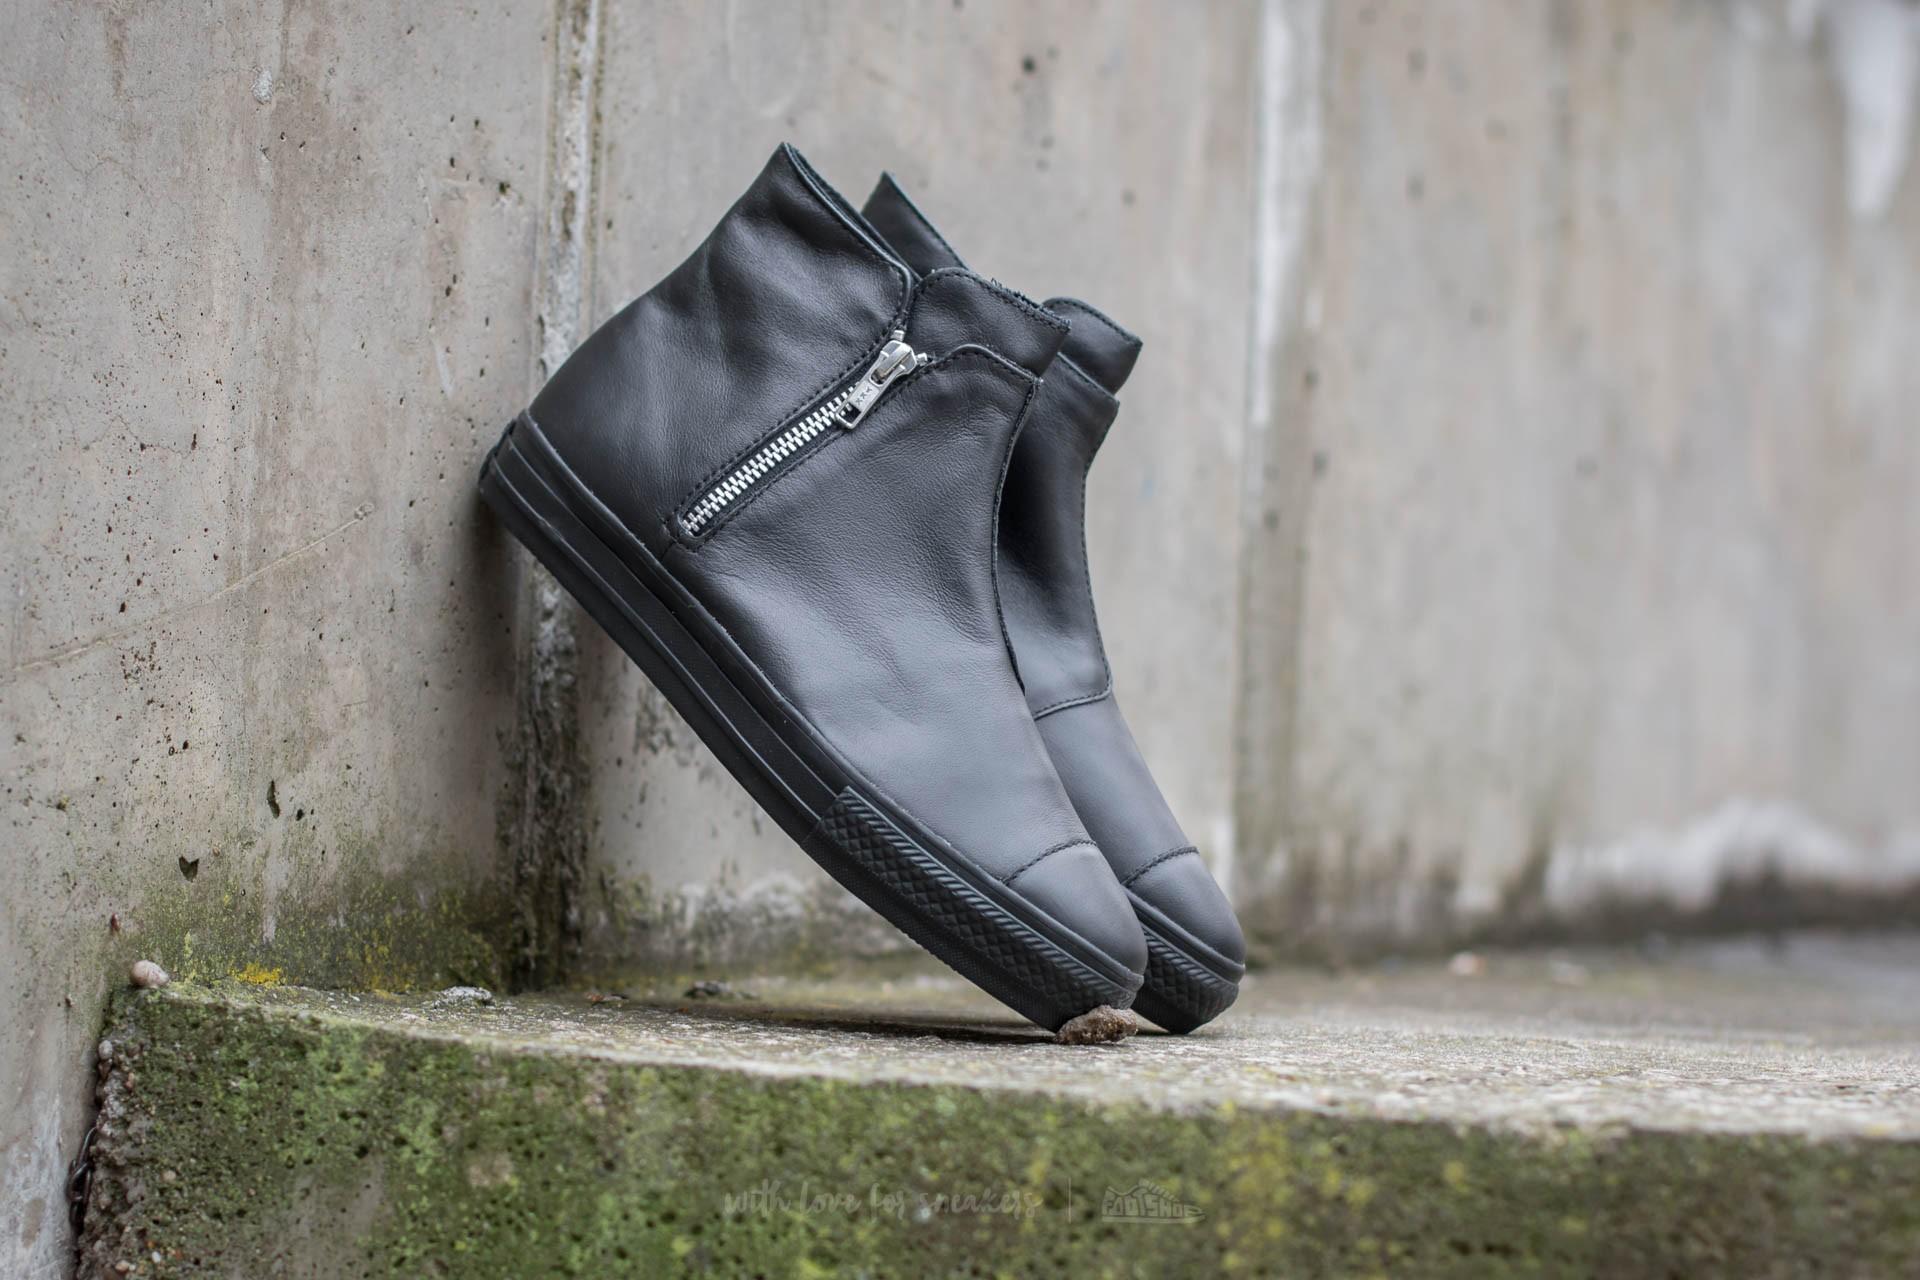 Converse Chuck Taylor All Star High Line Premium Leather Black/ Black/ Black